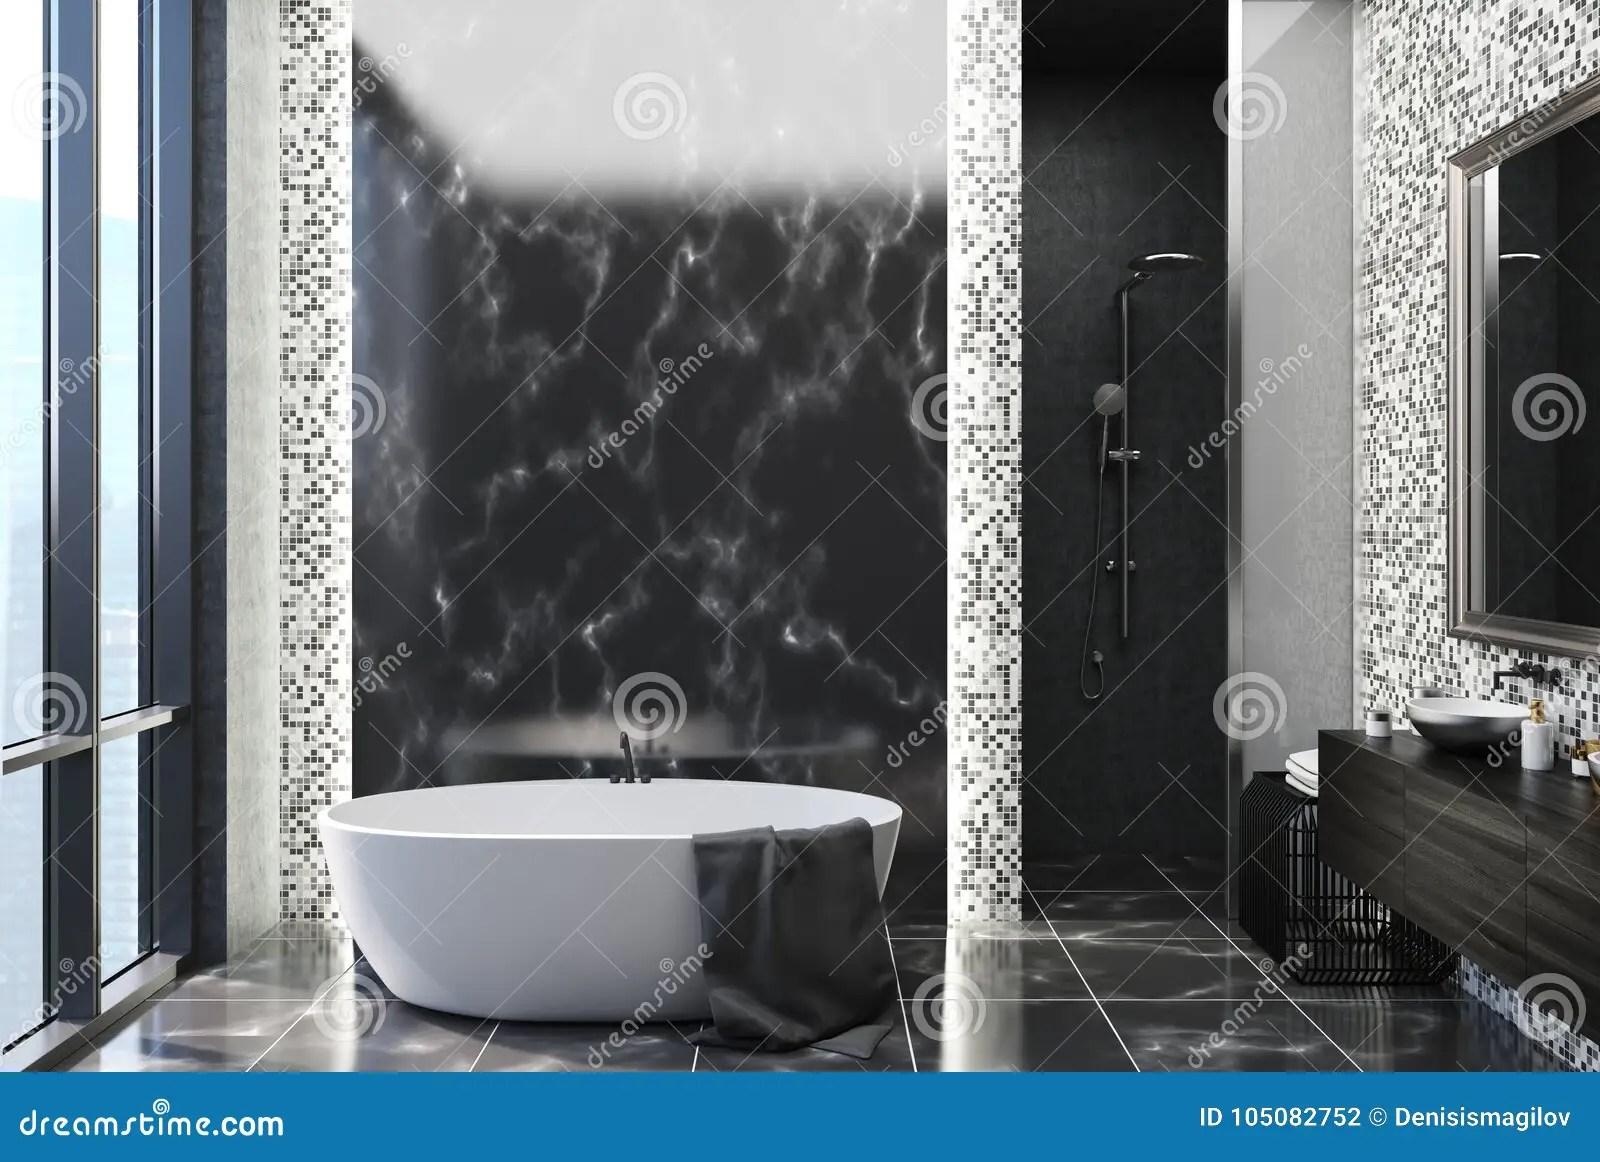 https www dreamstime com black marble tiles bathroom black marble gray tile bathroom interior black marble floor large window white image105082752